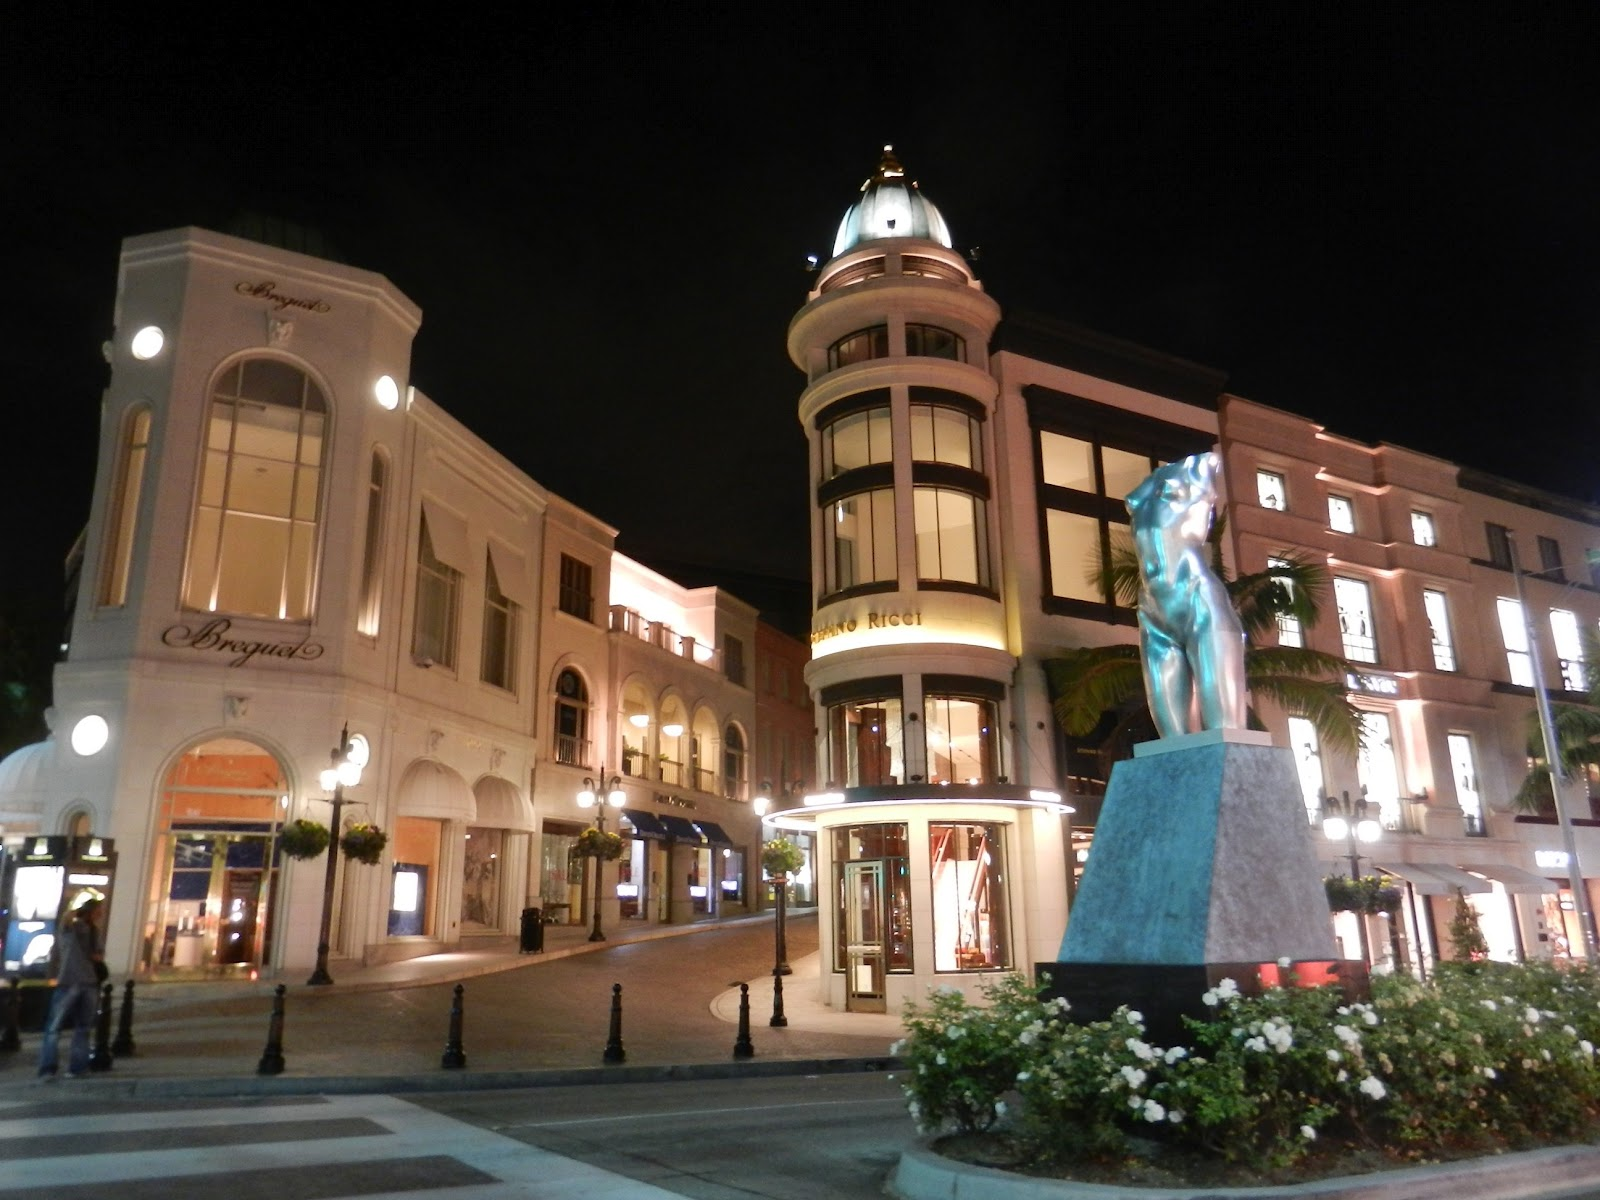 http://1.bp.blogspot.com/-AVfnKbdG7rU/UCpsJZ6J5kI/AAAAAAAAF7Y/ScoAJp_kHaY/s1600/BH+-+Rodeo+Drive+RG+sculpture.jpg